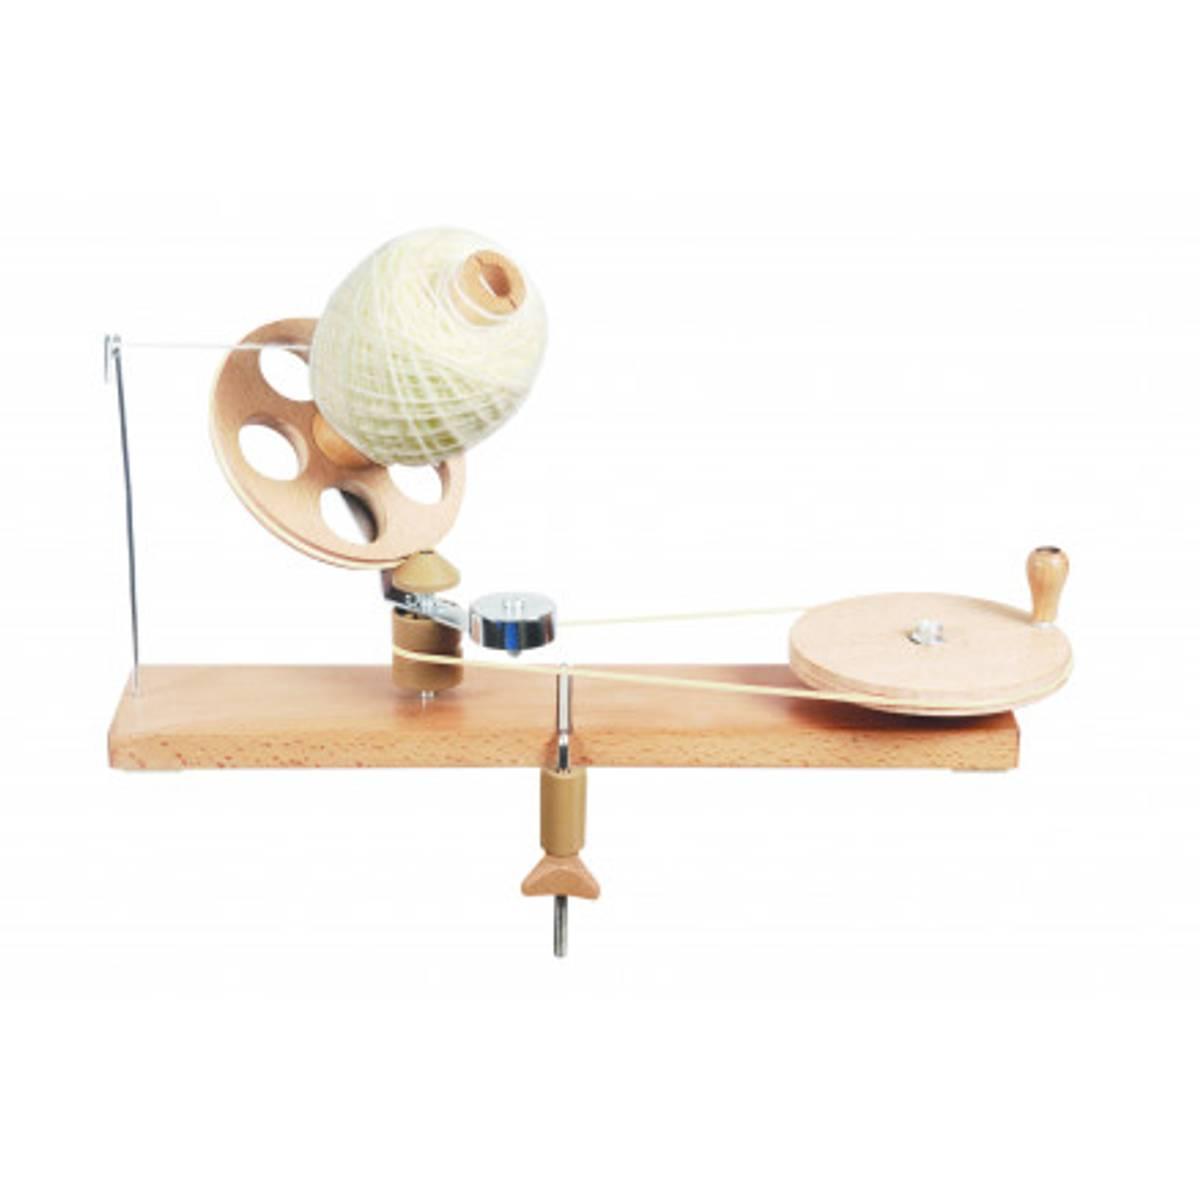 Knit Pro Natural Wood Winder